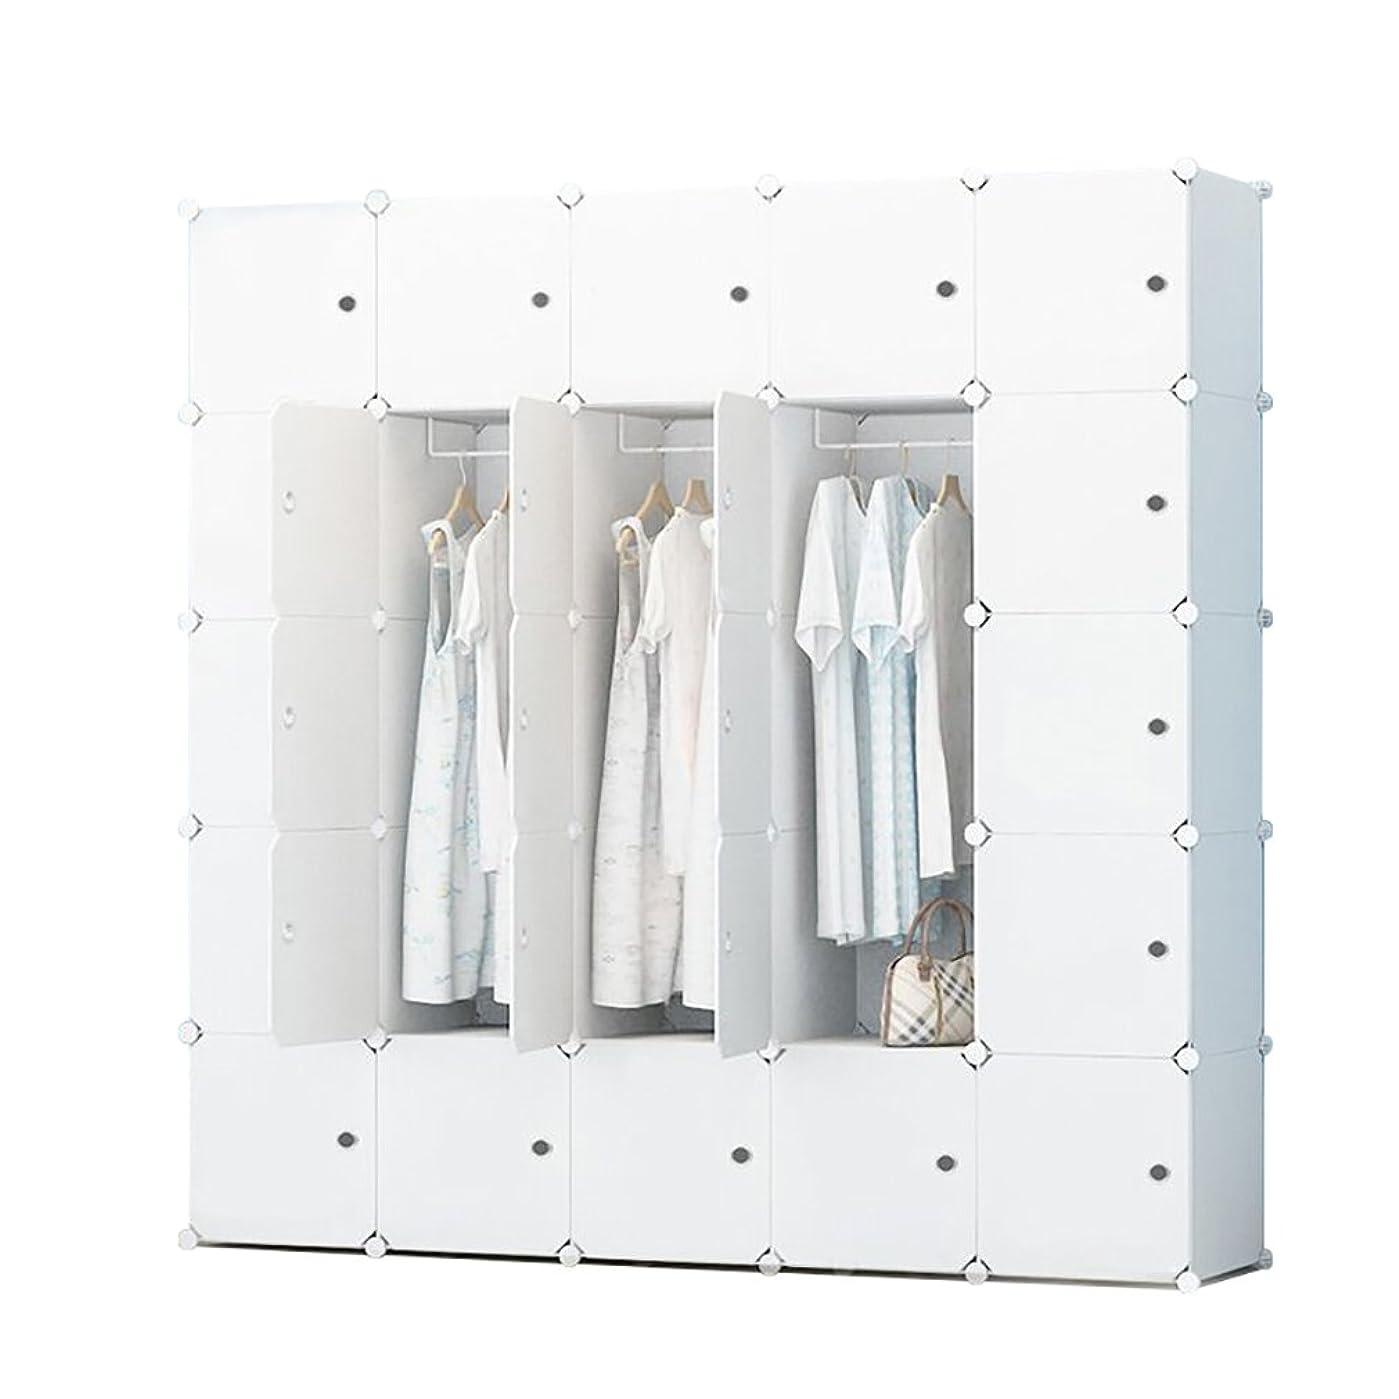 MIRUIDA17 衣類収納洋服 ラック整理棚収納ボックス扉付き 収納棚 組立式 クローゼット 収納ボックス ホワイト